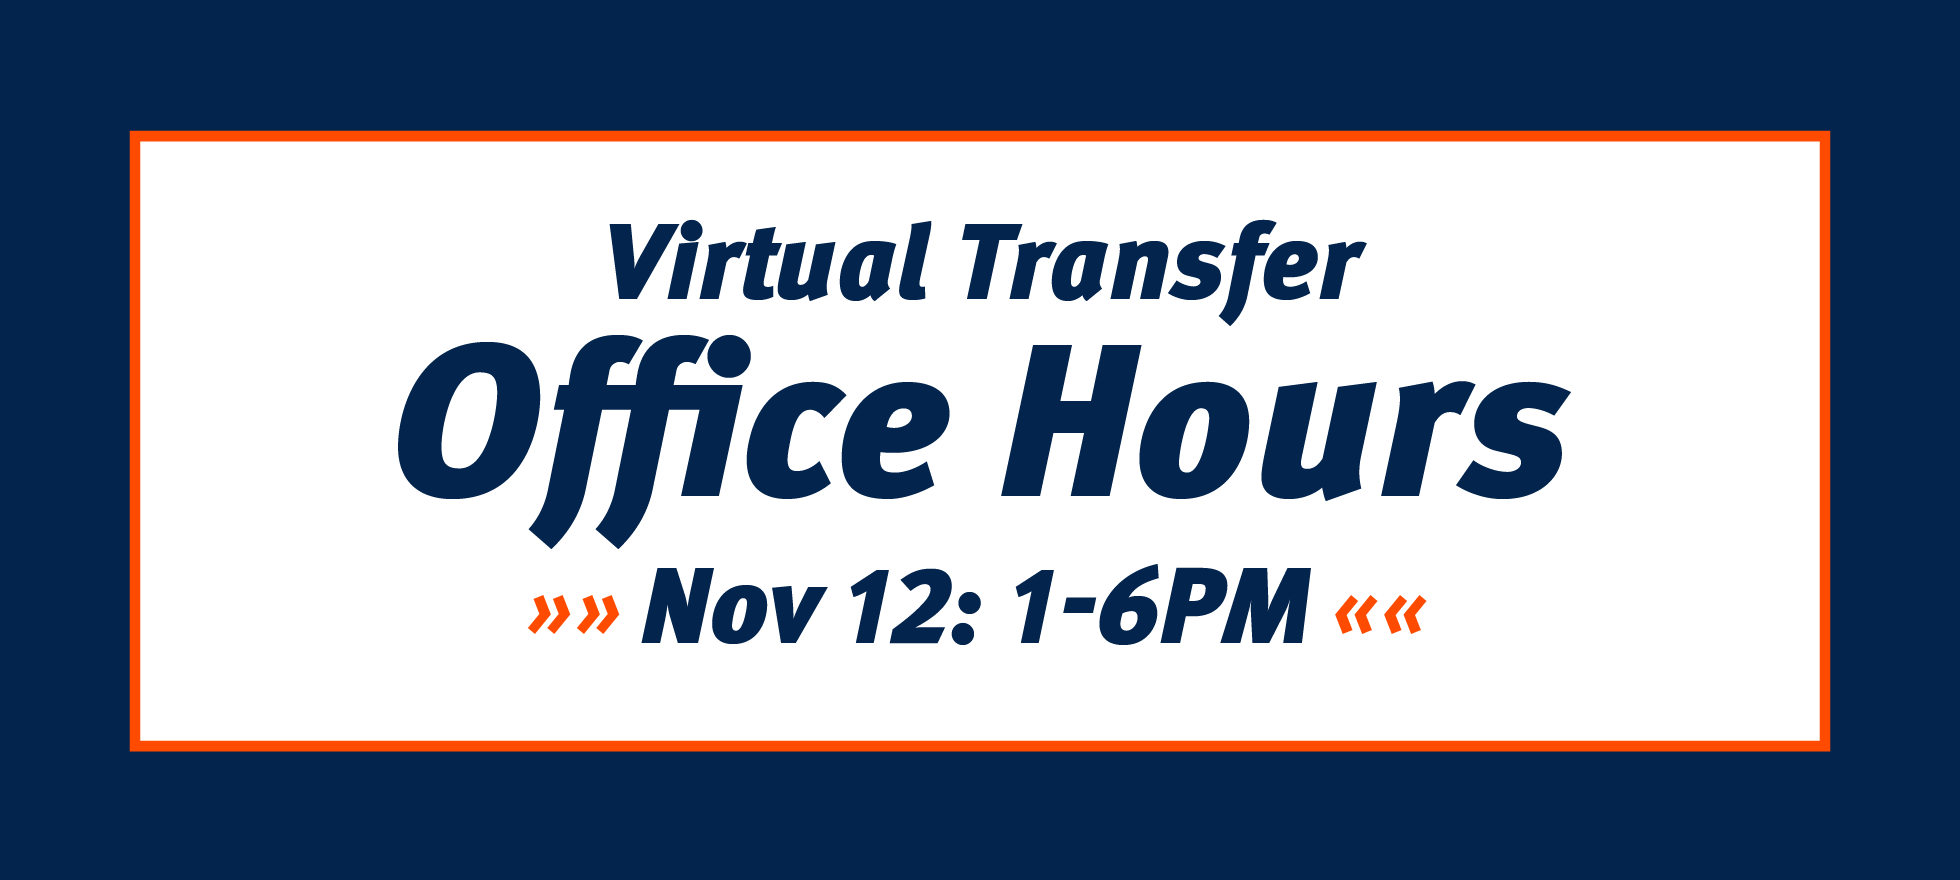 Virtual Transfer Hours